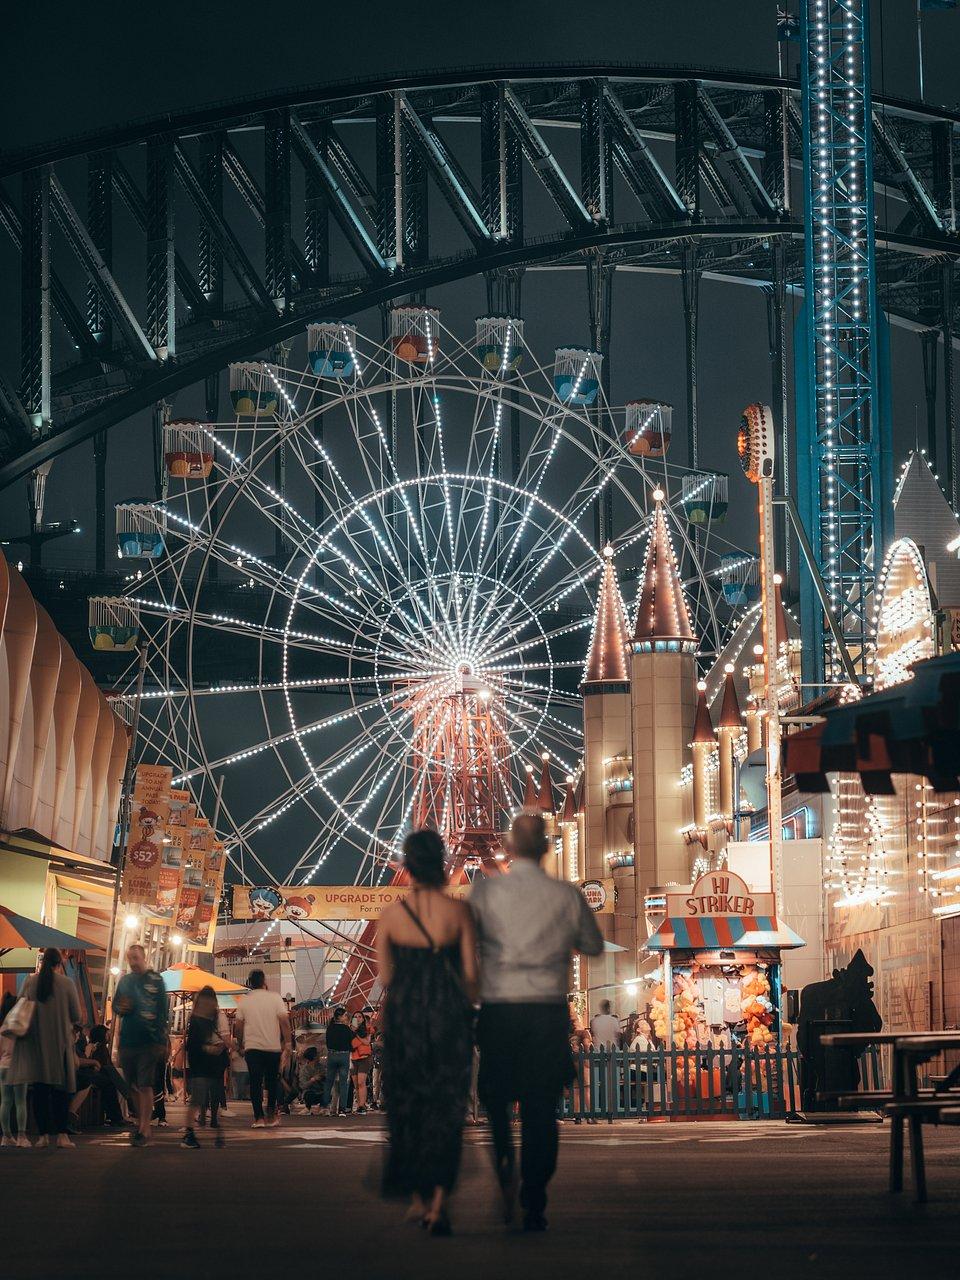 Location: Sydney, Australia